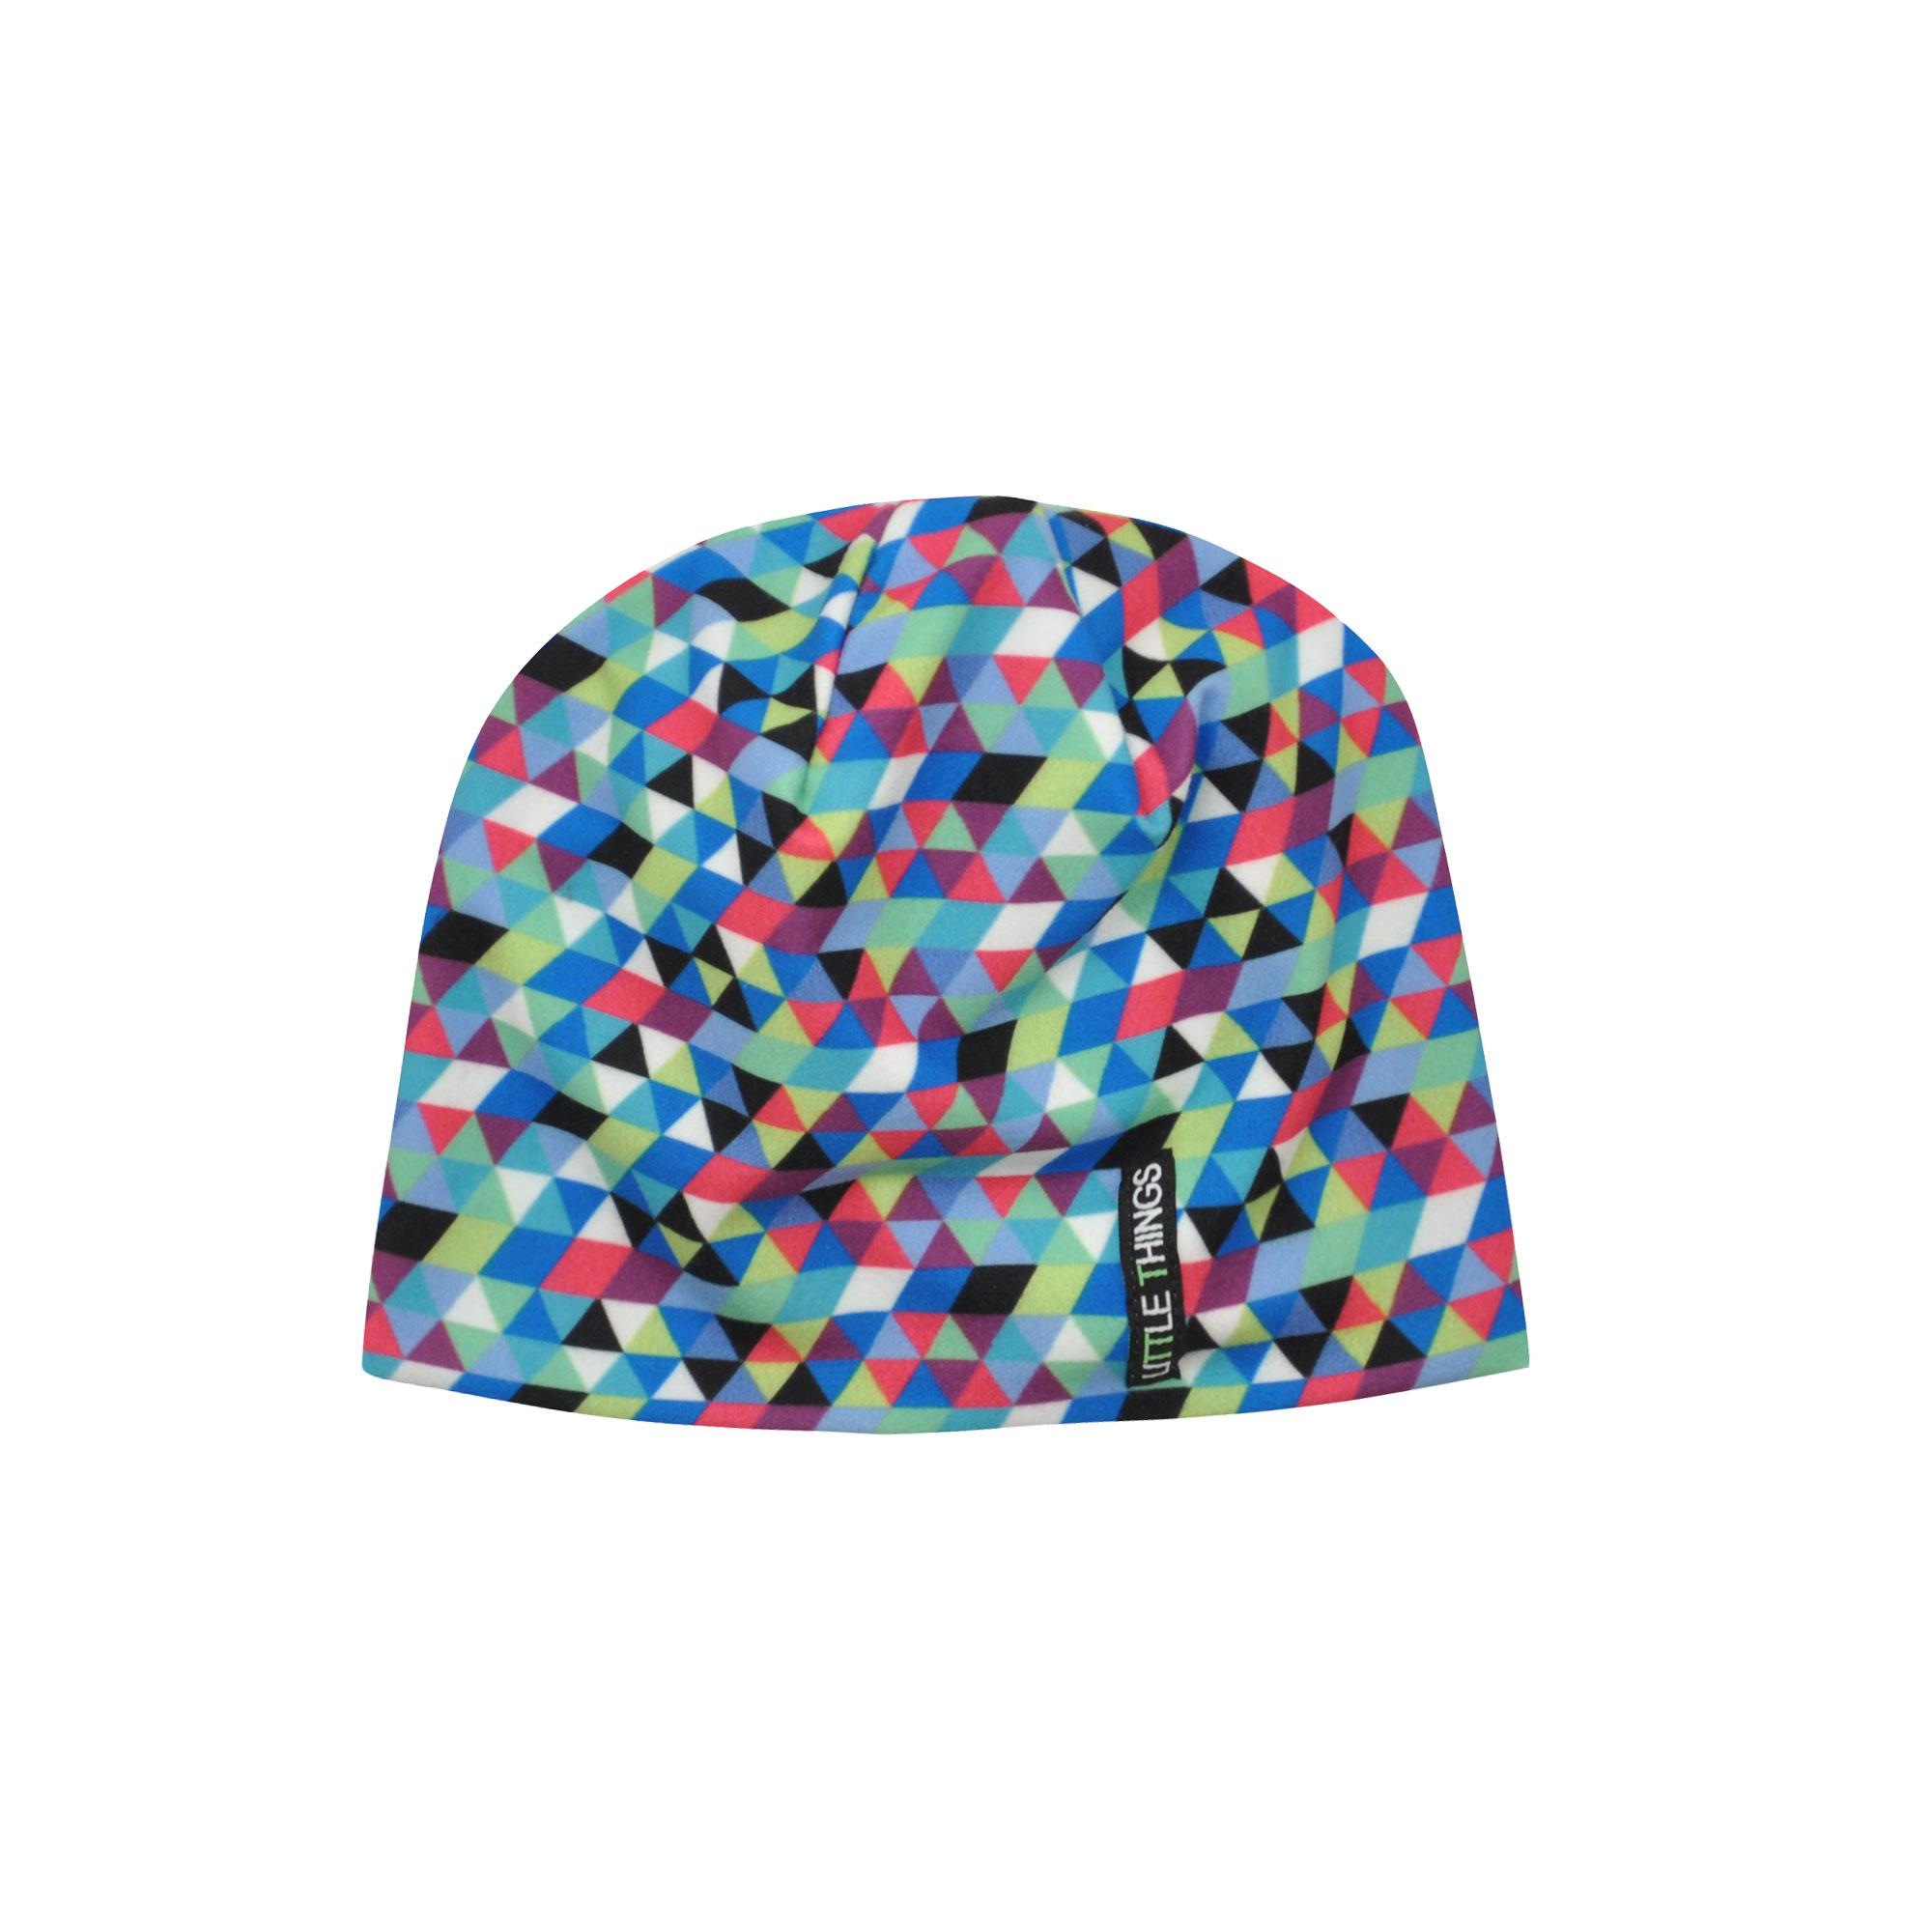 dětská vzorovaná čepice triangl  0bba03e1ba